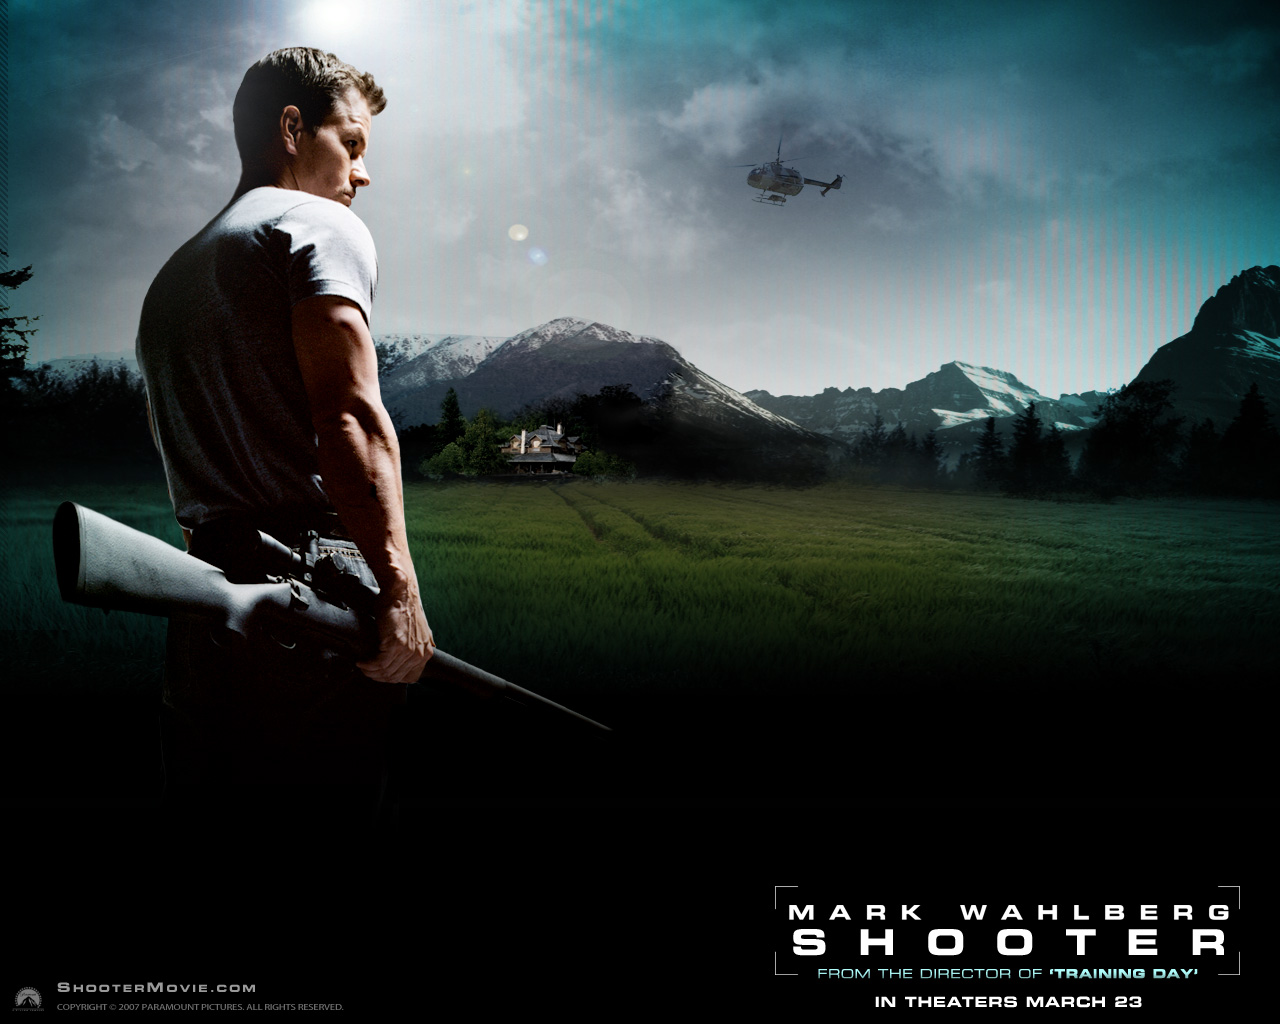 http://3.bp.blogspot.com/-8ZOZPviBIjc/UGkVChNq4II/AAAAAAAABhU/qgkUFes4GtE/s1600/shooter-mark-wahlberg-250361_1280_1024.jpg